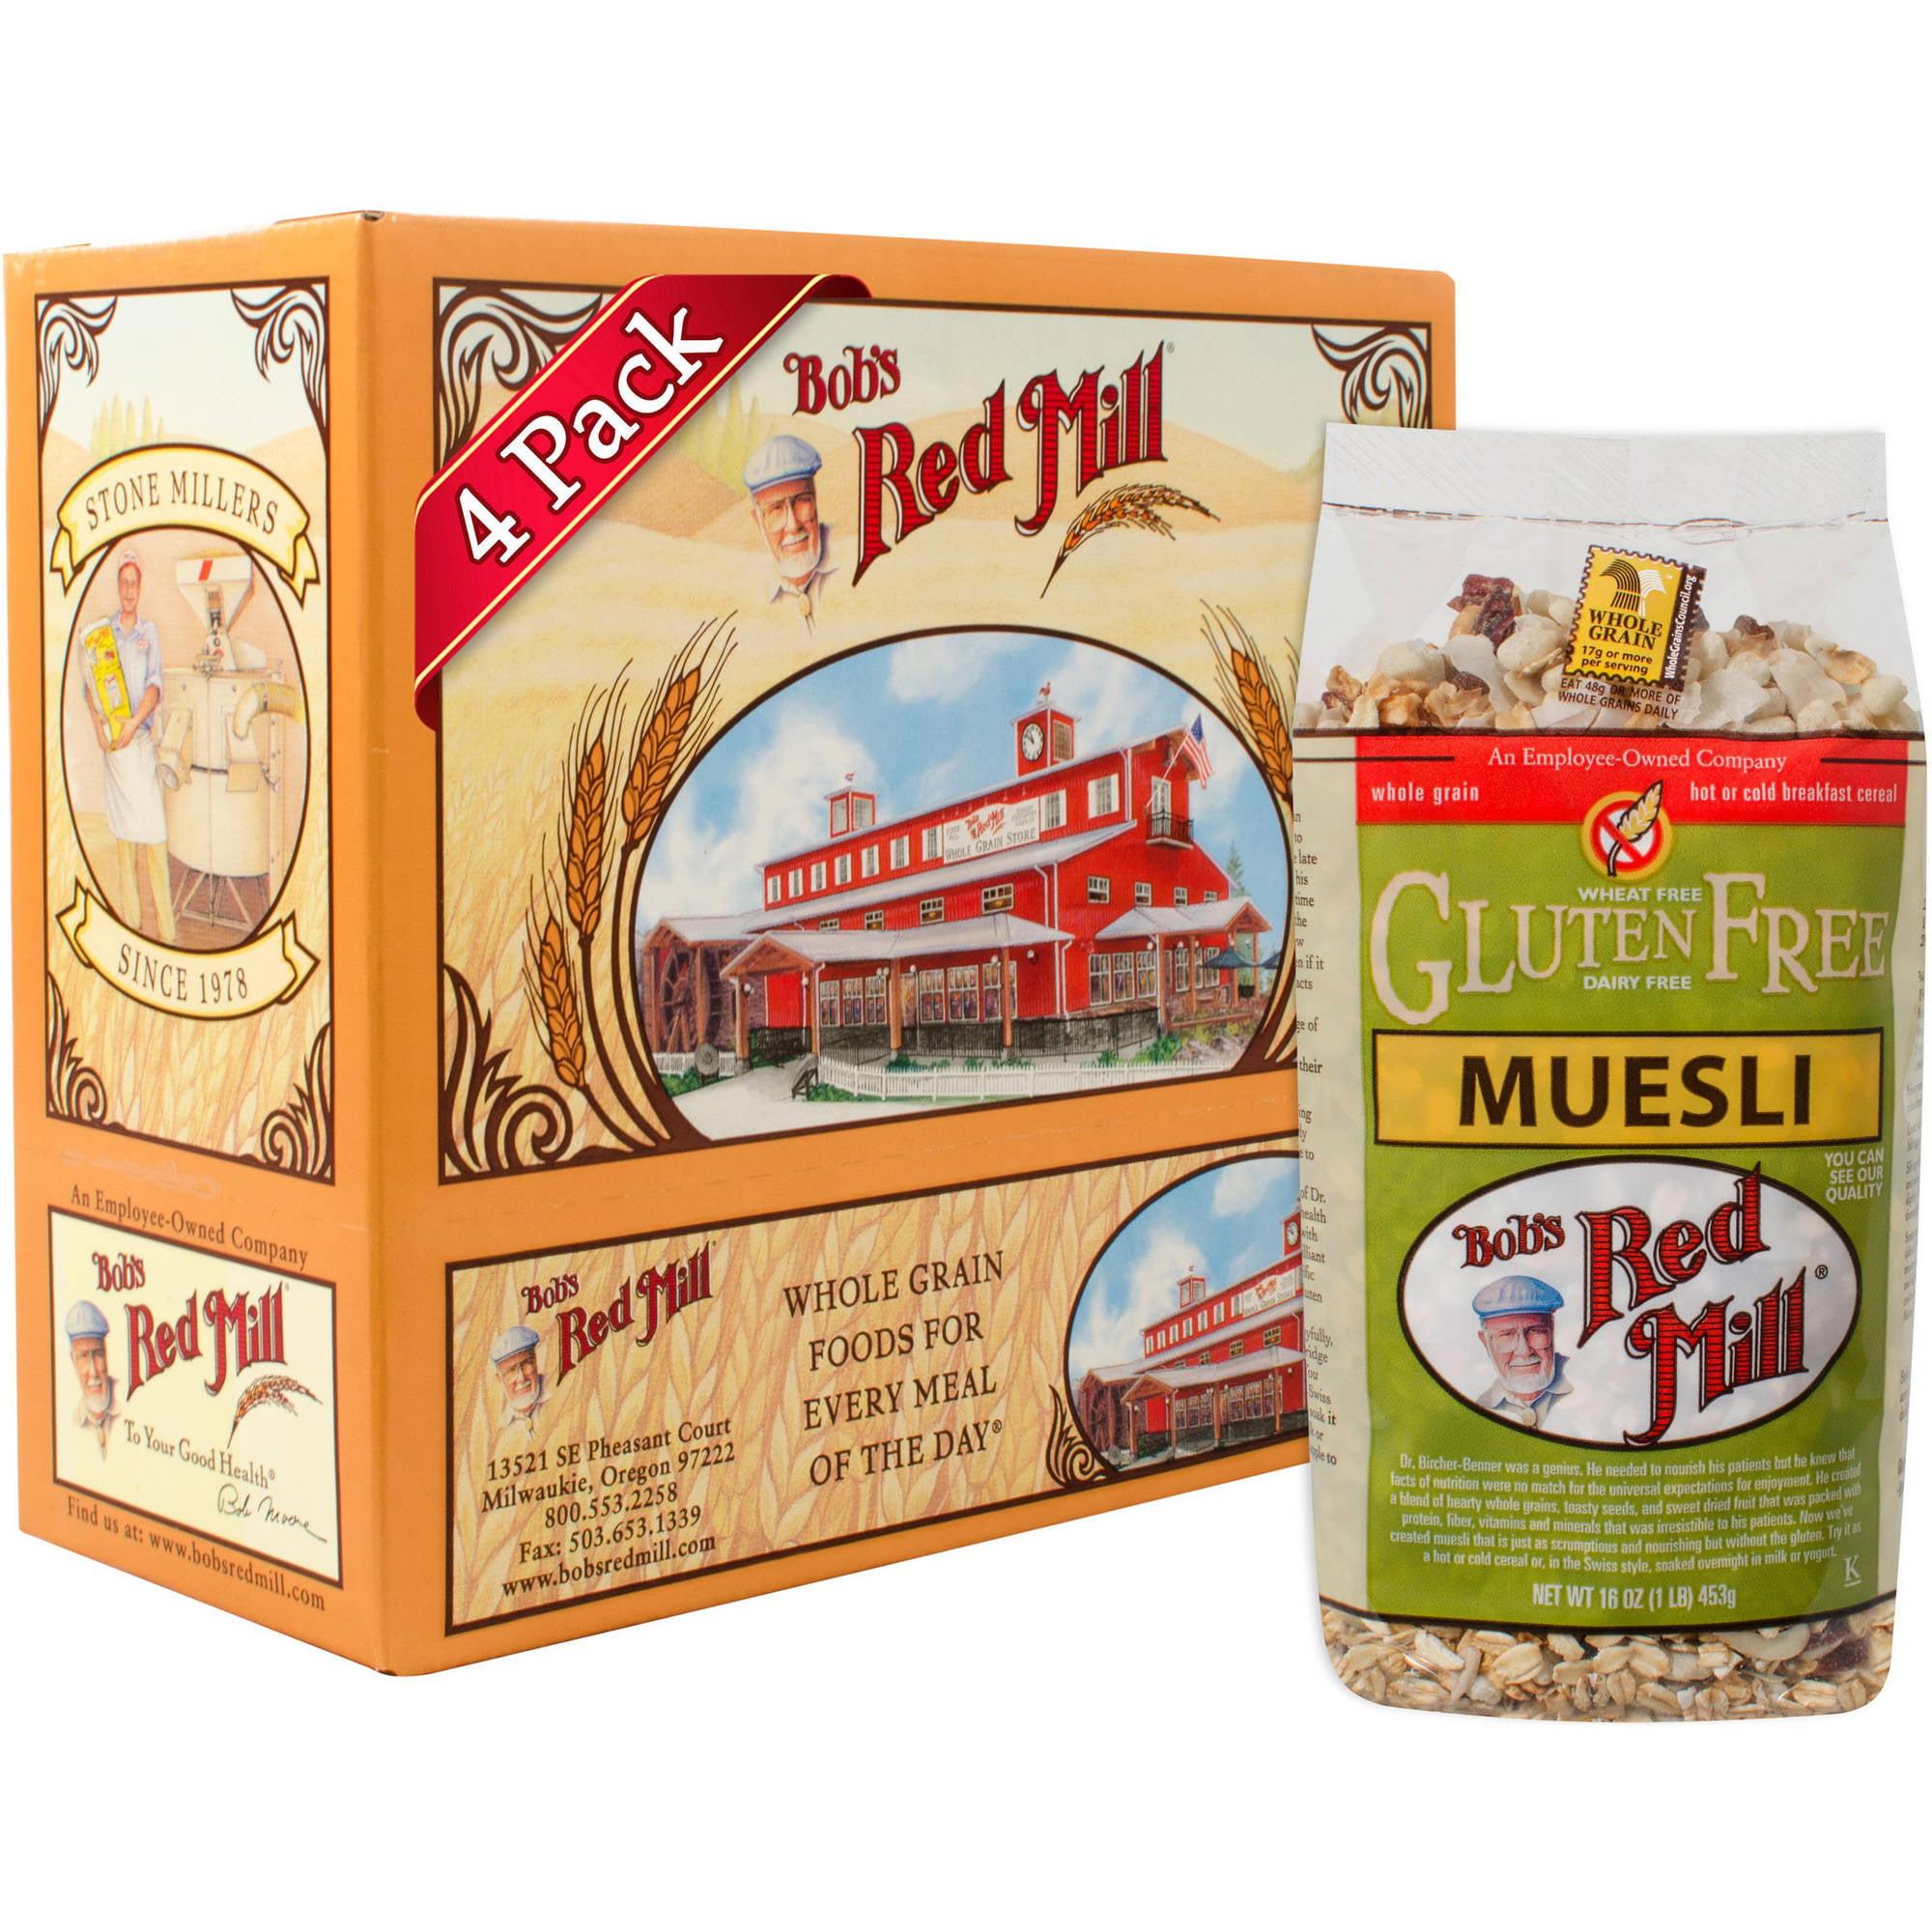 Bob's Red Mill Muesli Nutrition Facts